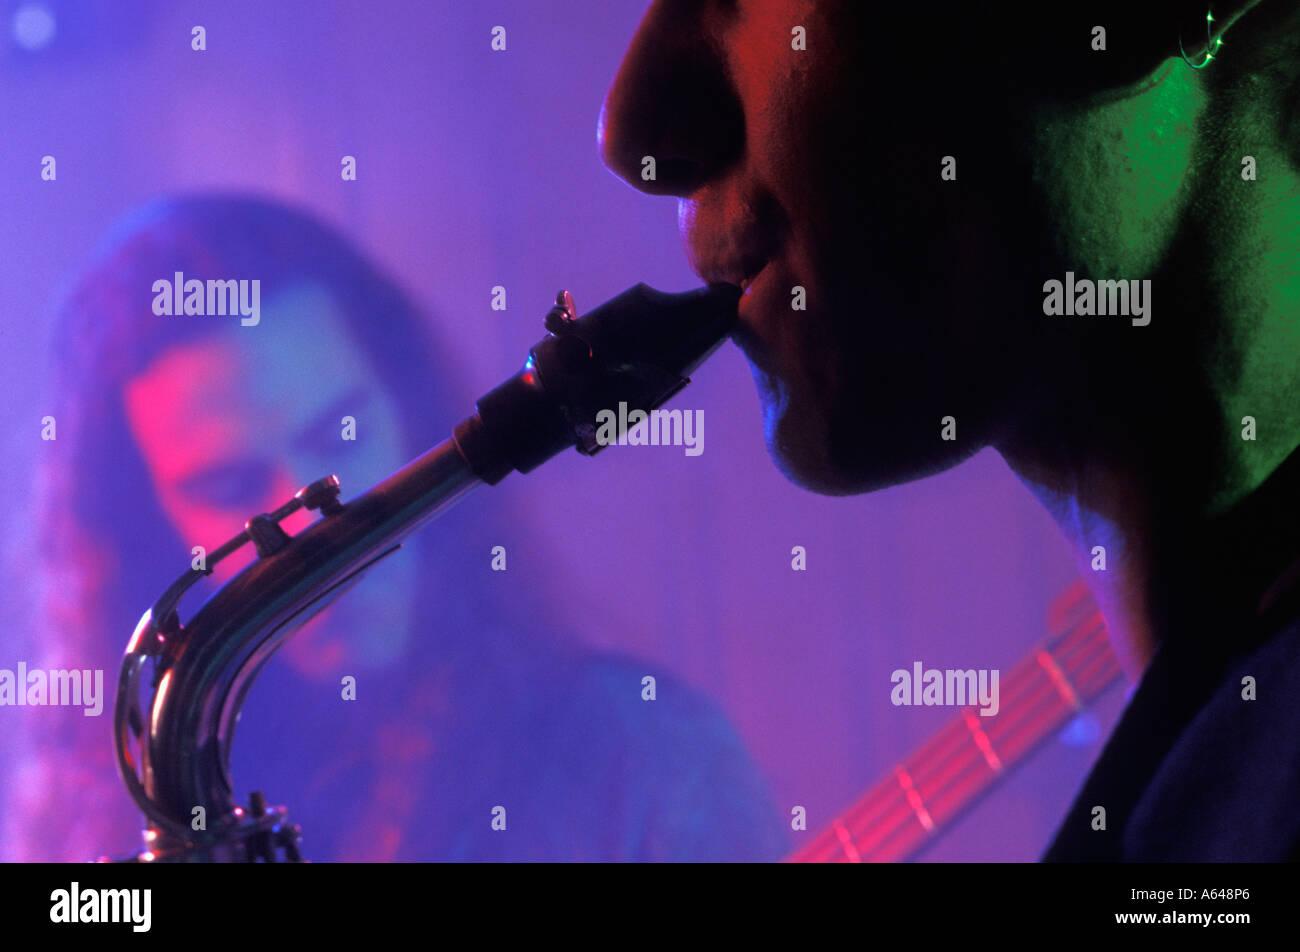 Jazz saxaphone player - Stock Image